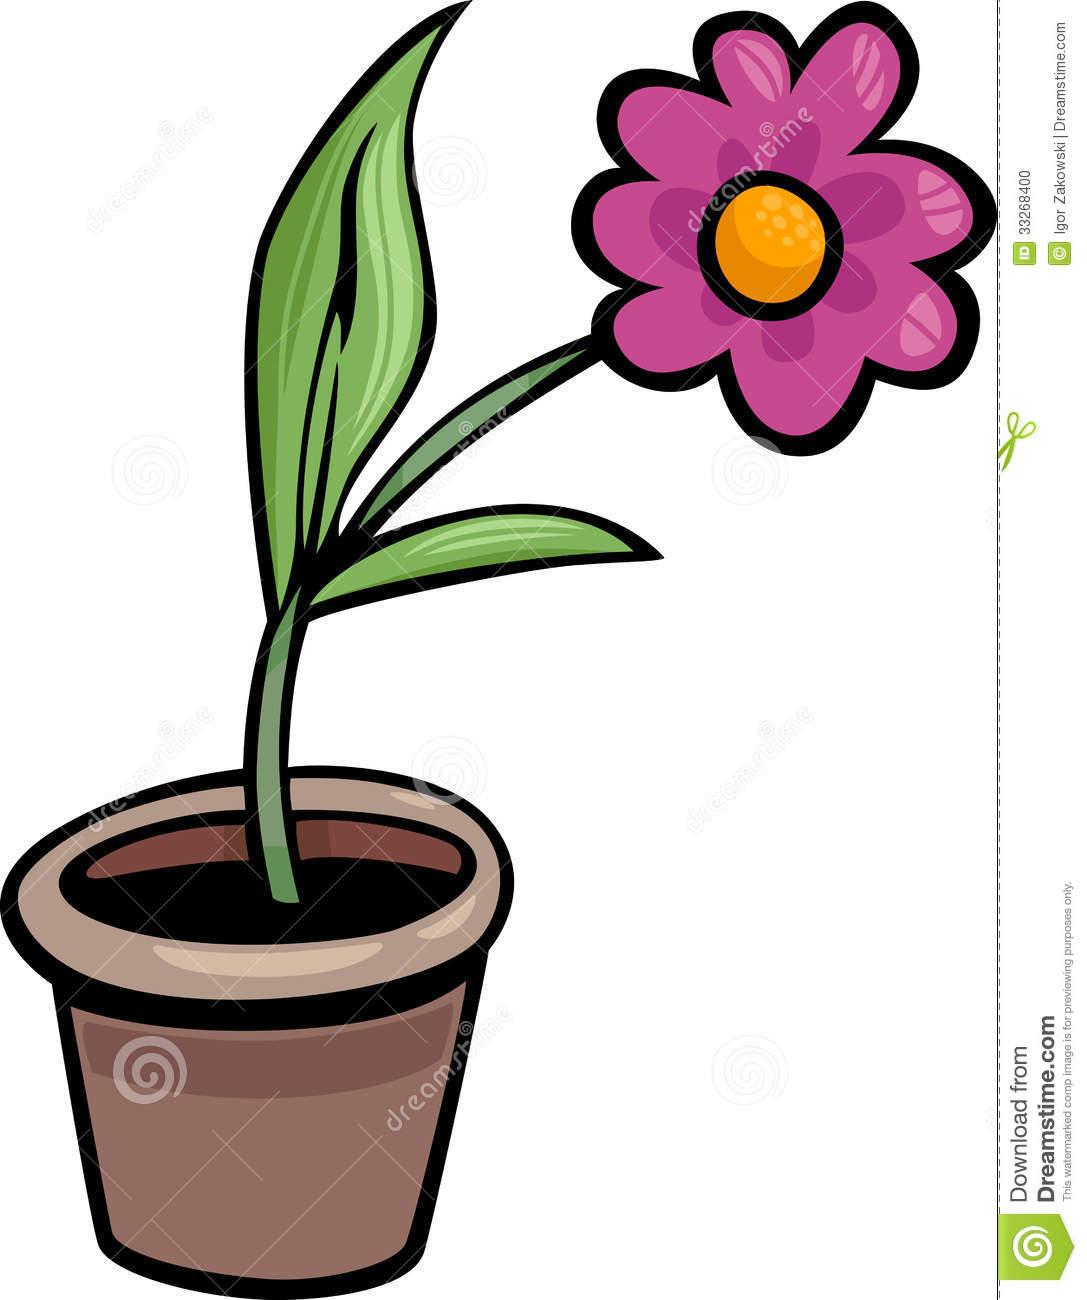 1087x1300 Powerful Flower Cartoon Pictures Clip Art Colorful Simplistic